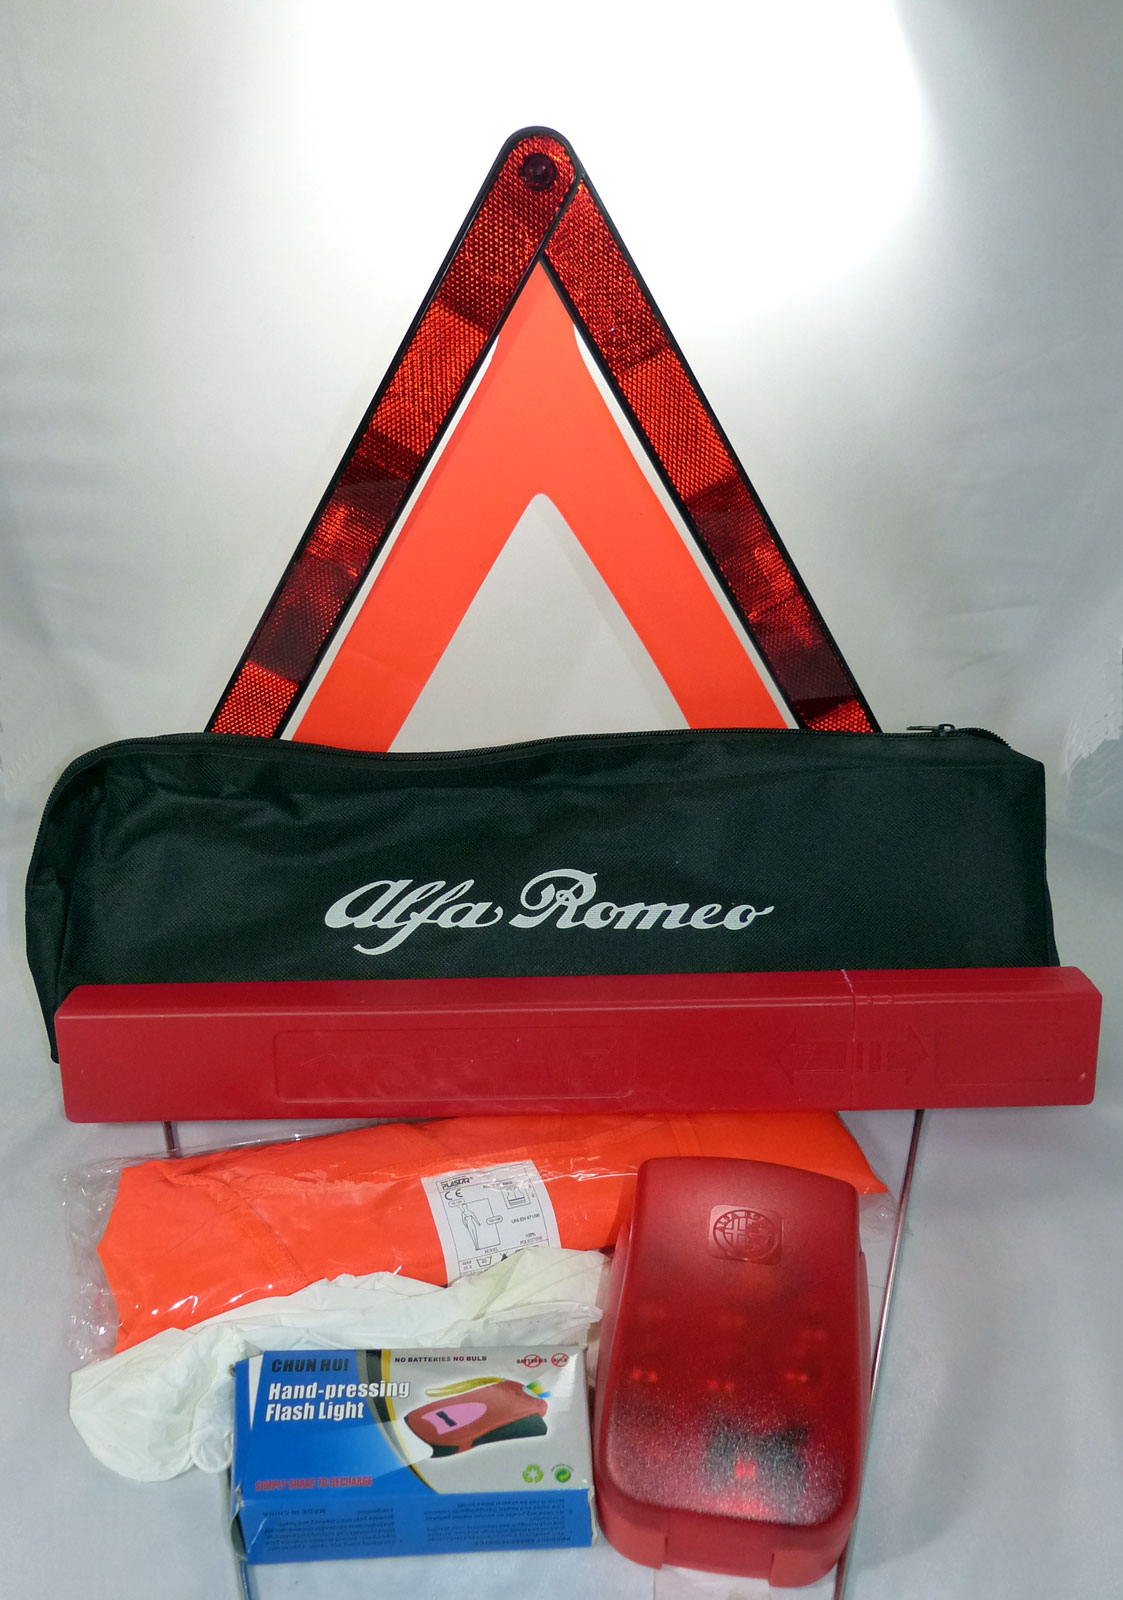 Alfa Romeo Notfallset Warndreieck Warnweste orig Lampenbox Taschenlampe